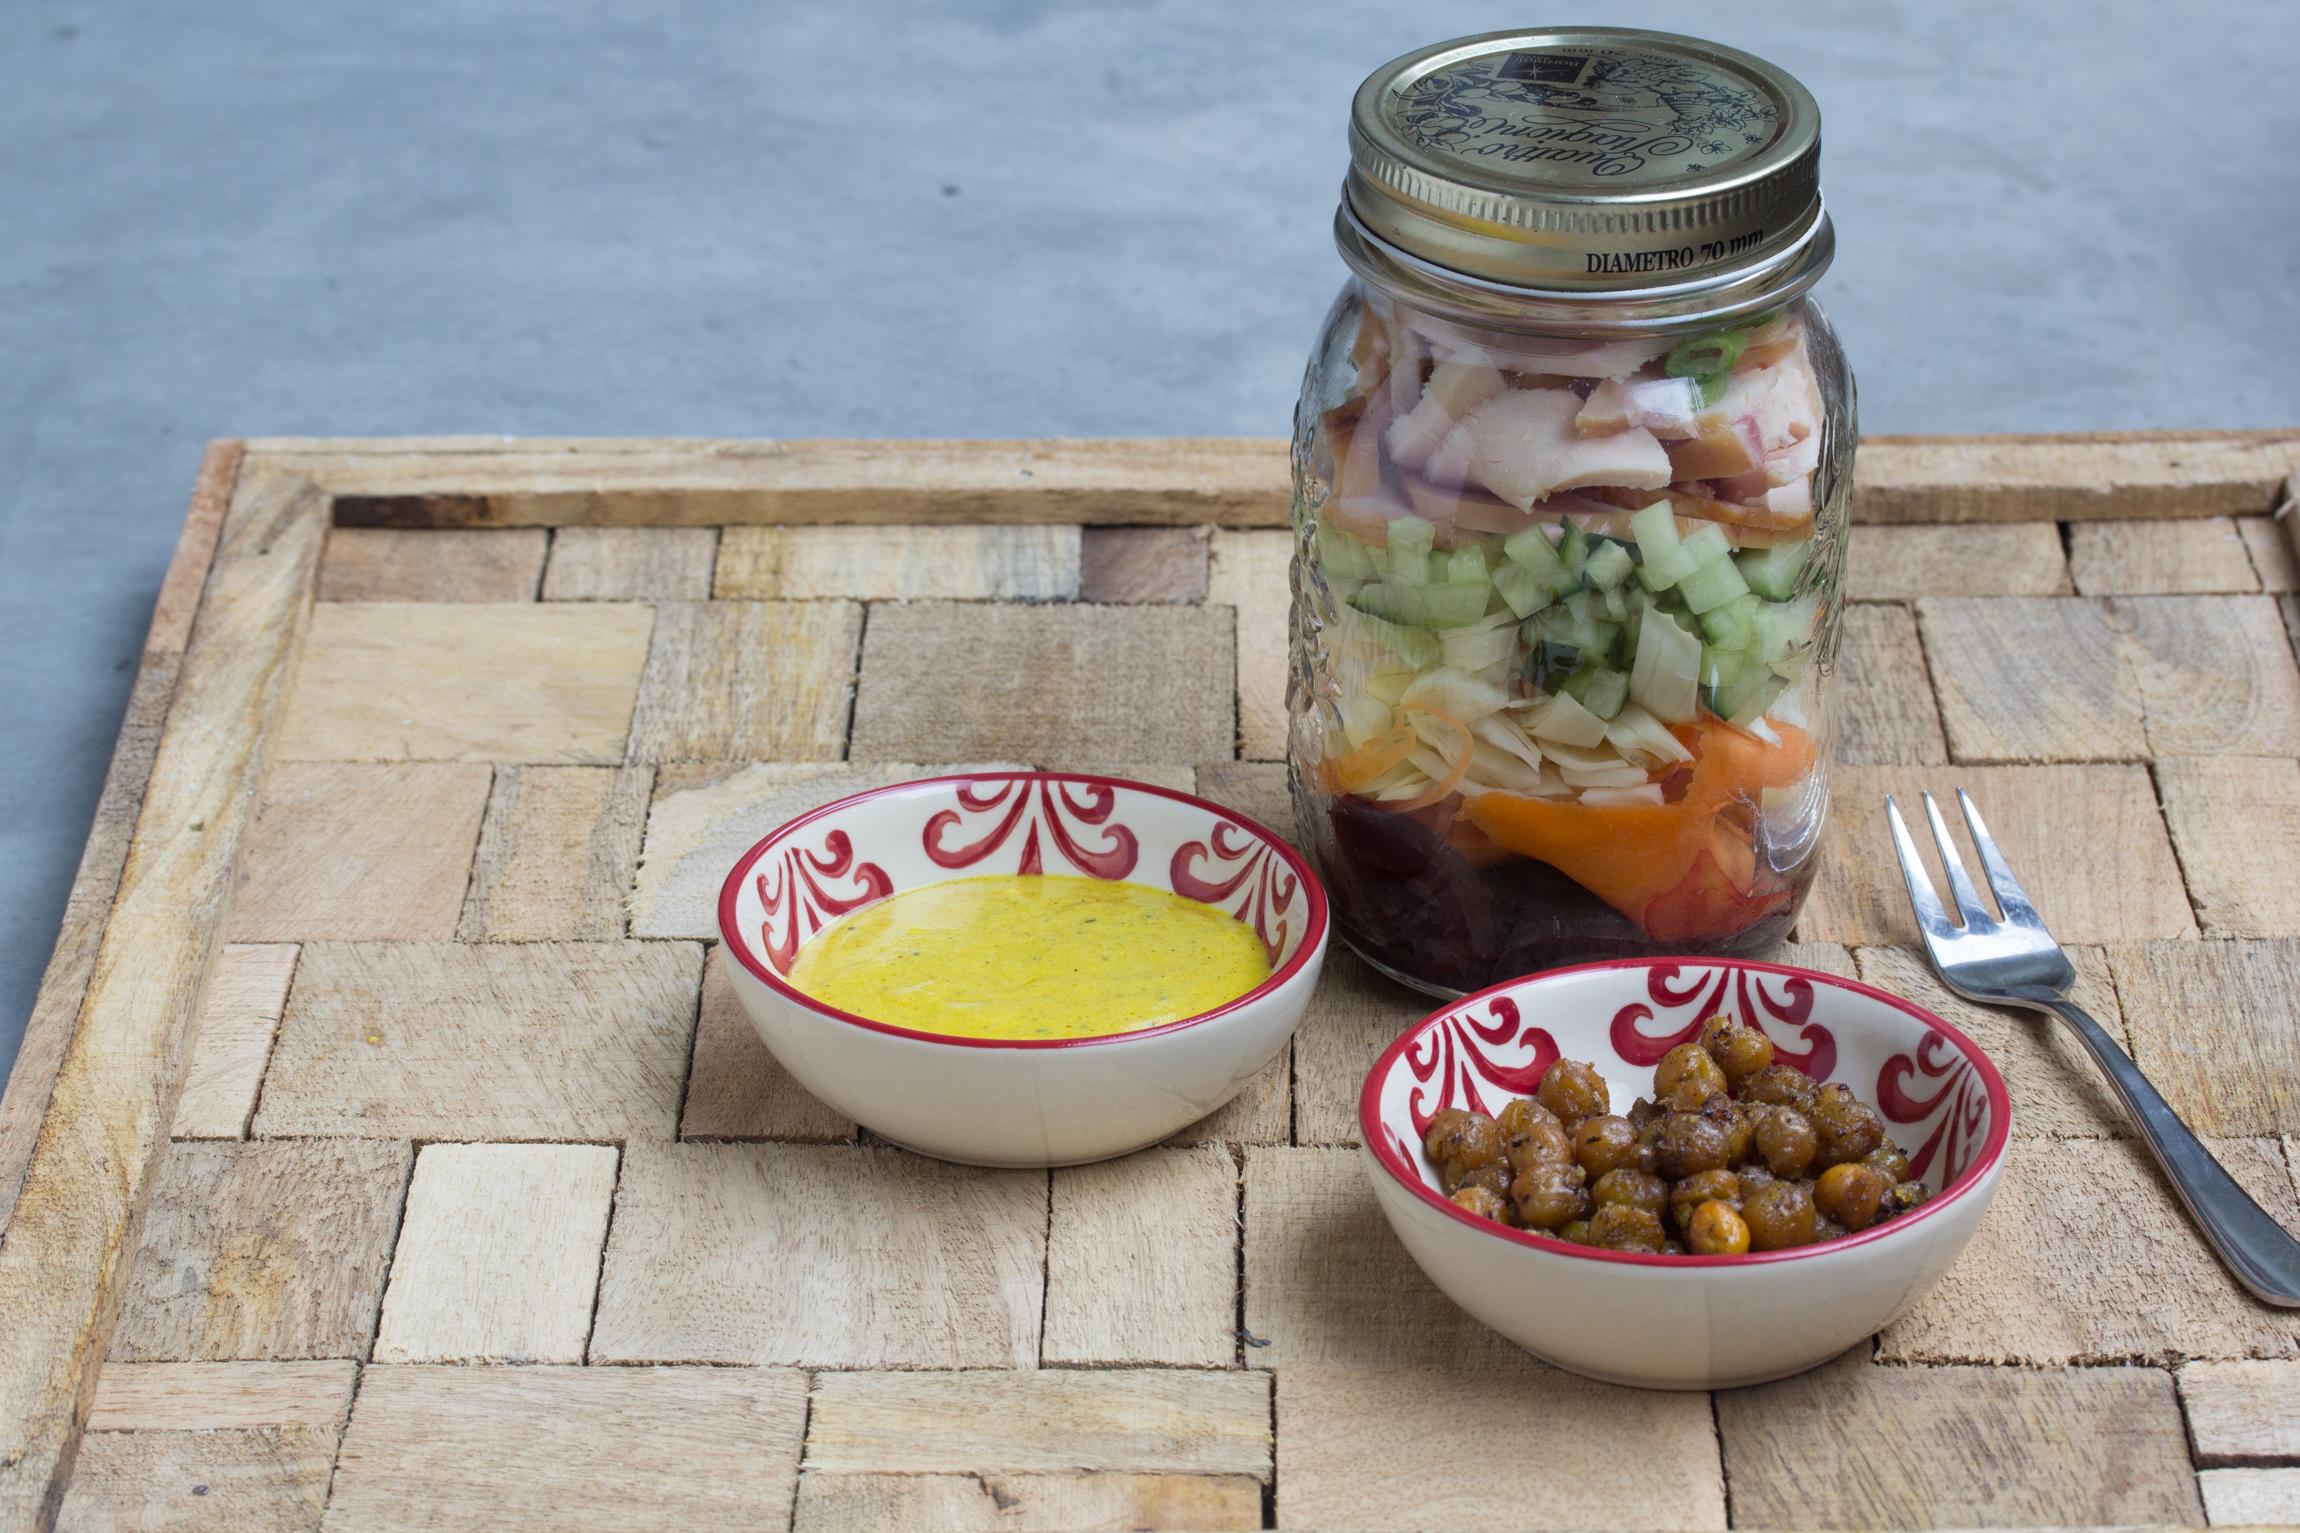 Salade gerookte kip en rode biet